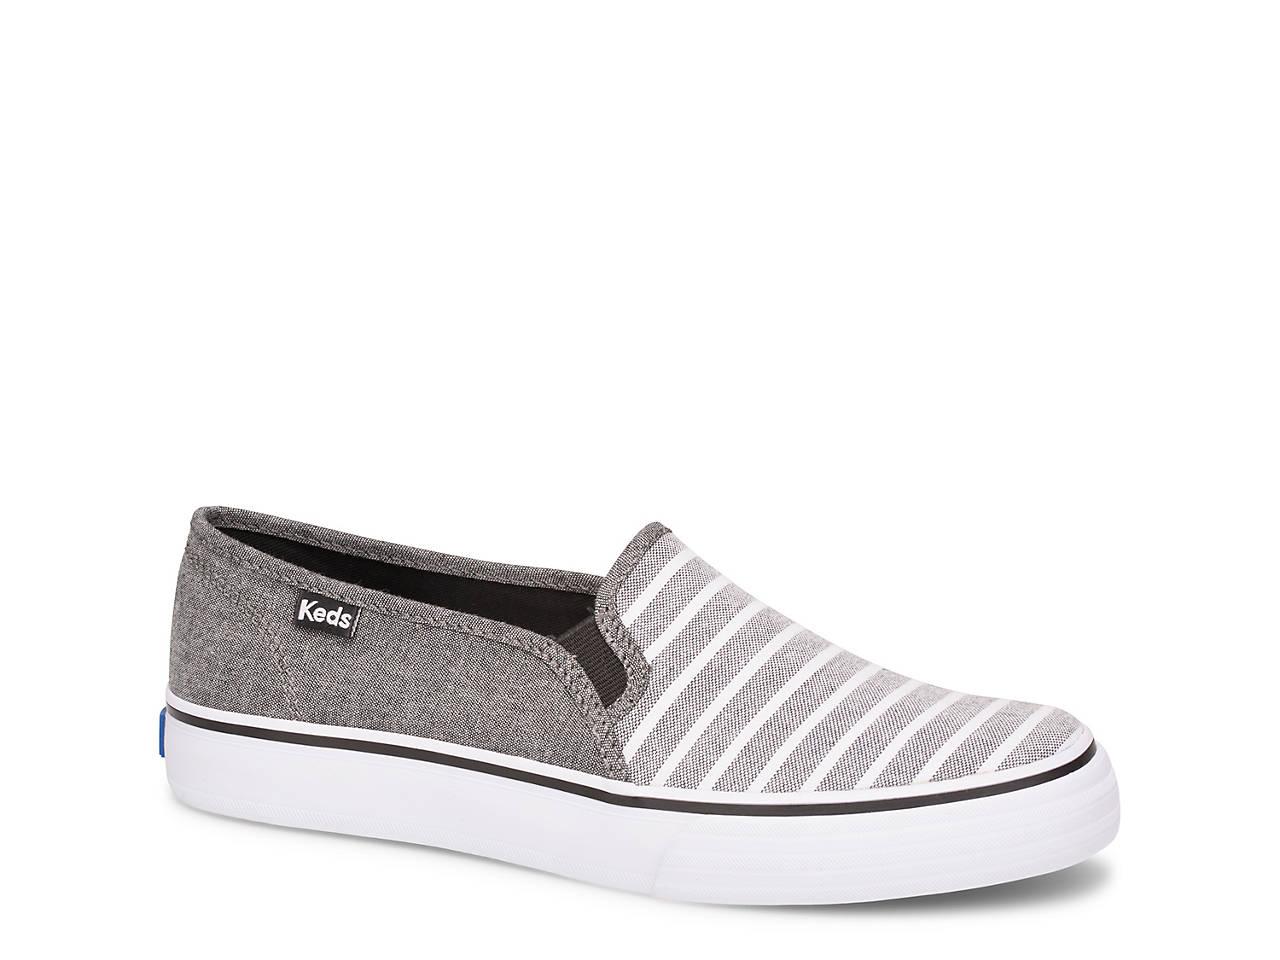 e4144e39637 Keds Double Decker Slip-On Sneaker - Women s Women s Shoes